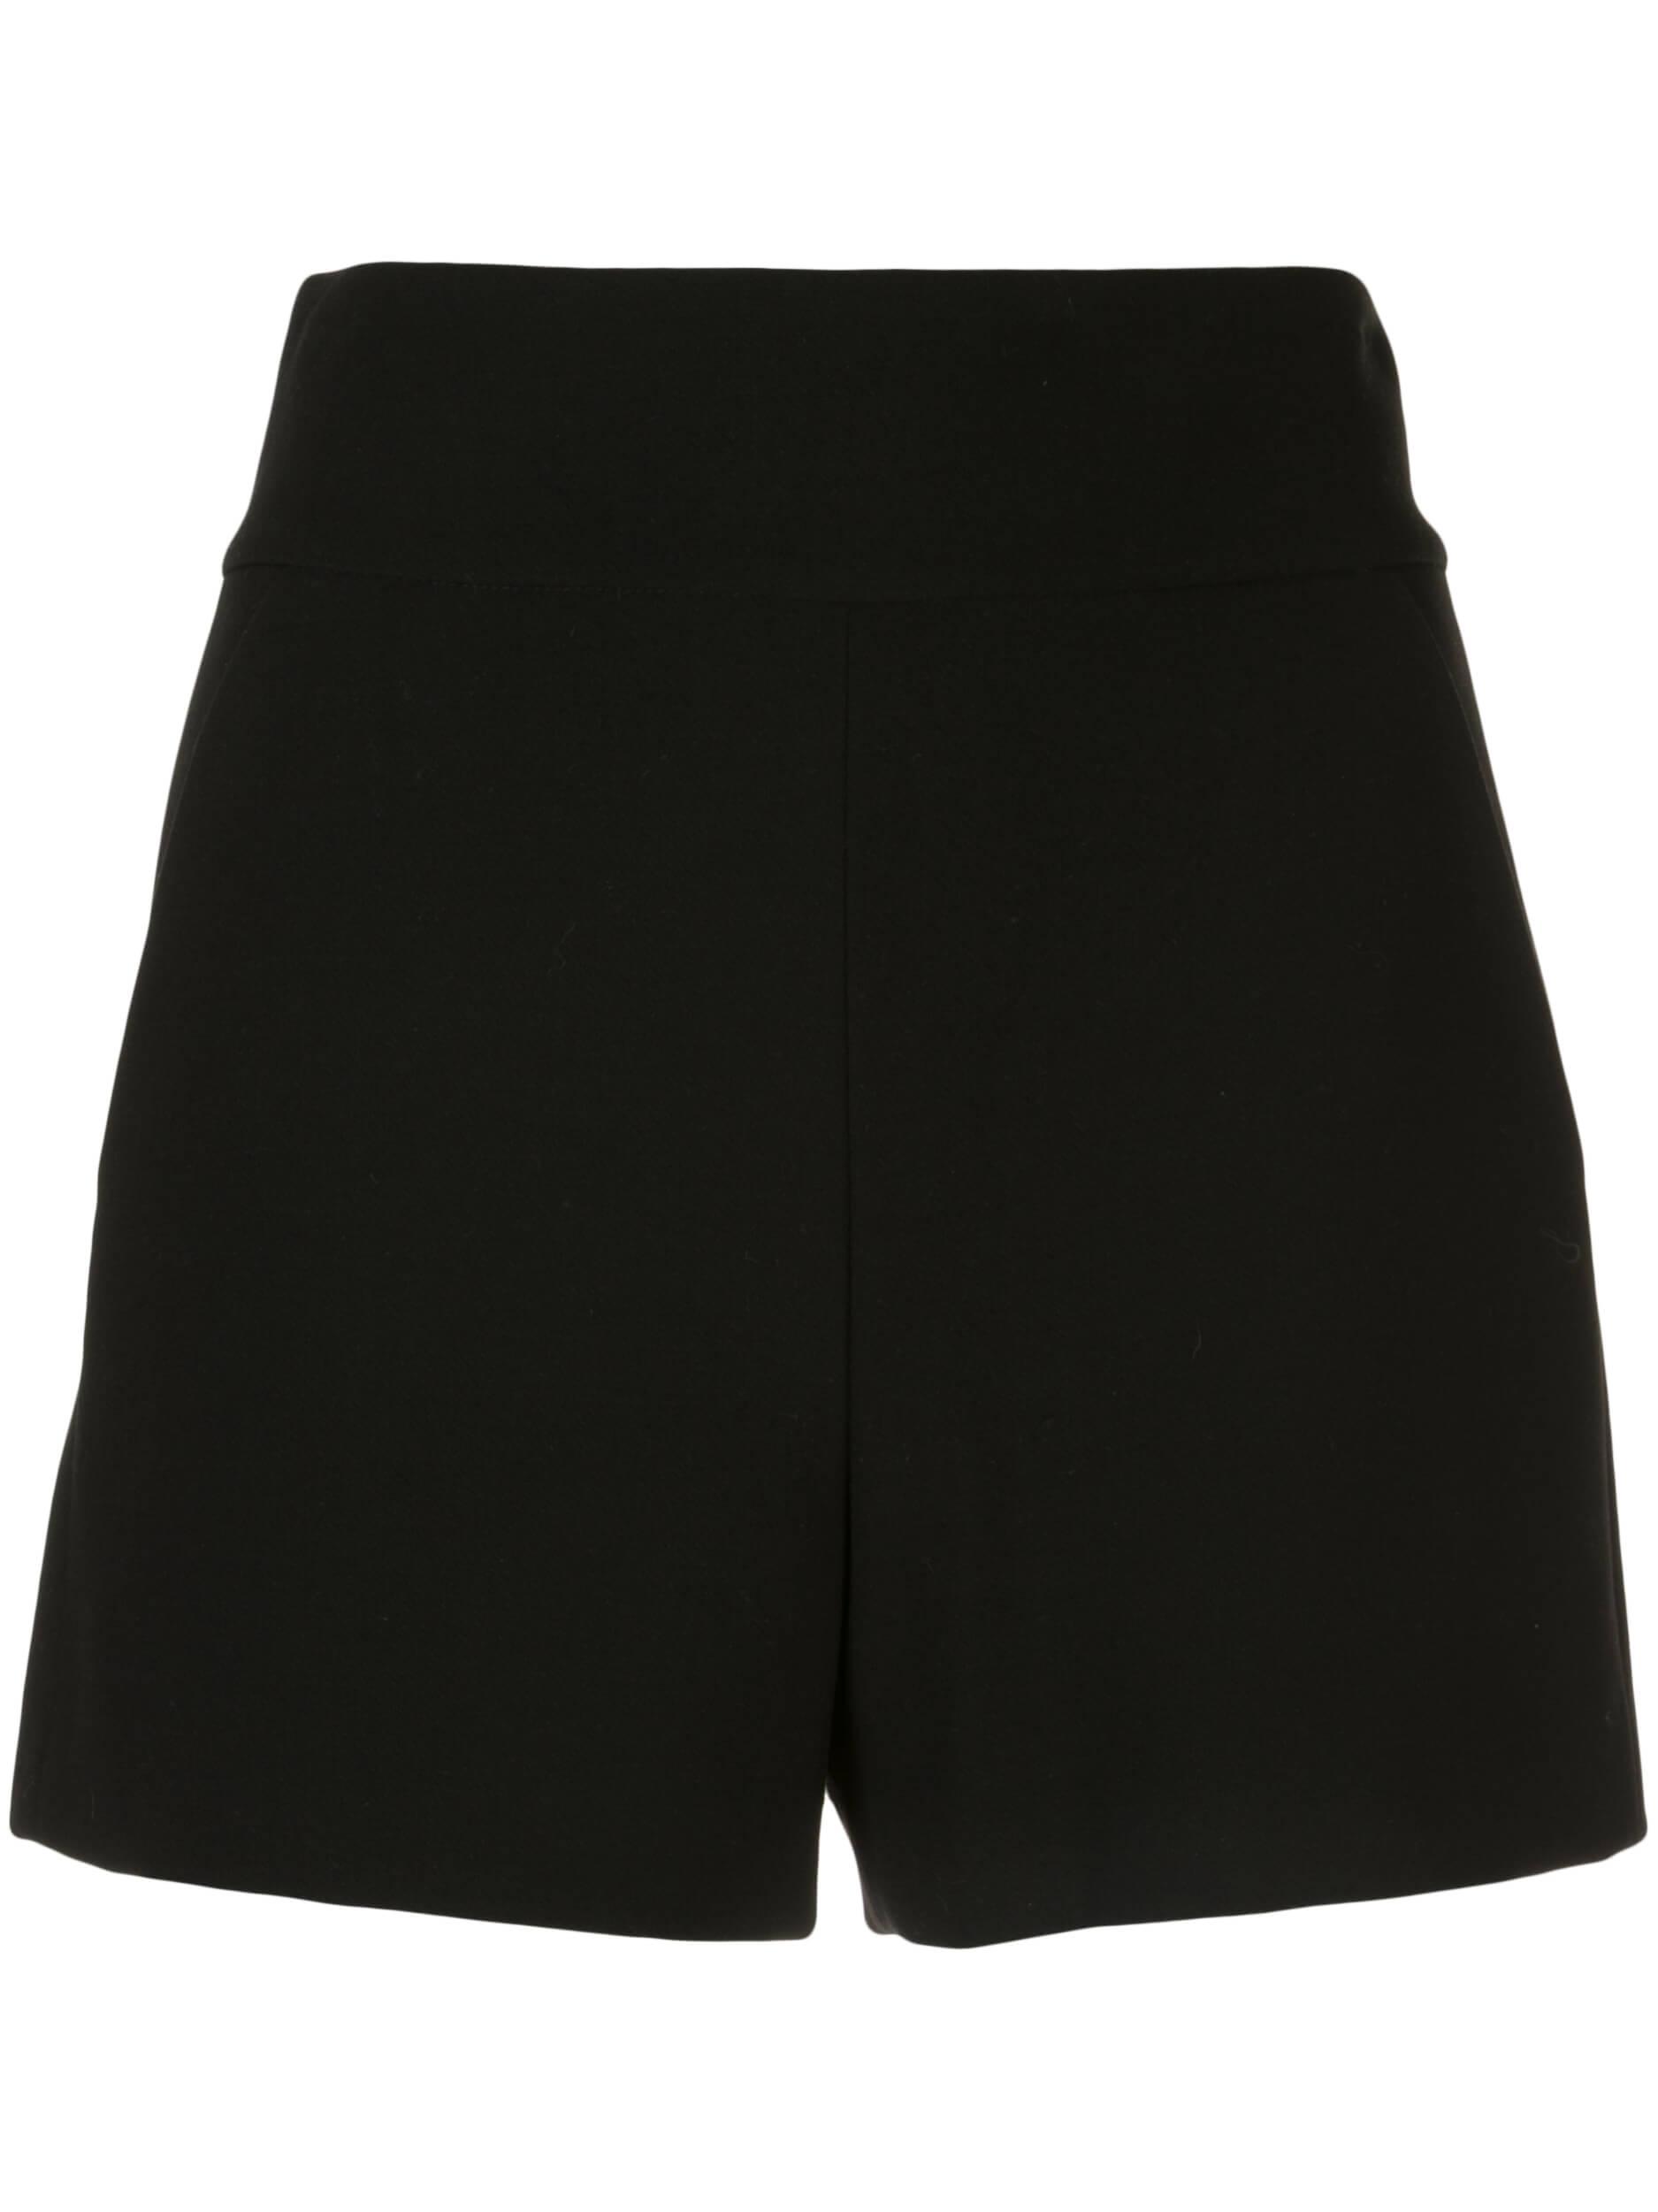 Donald High Waisted Shorts